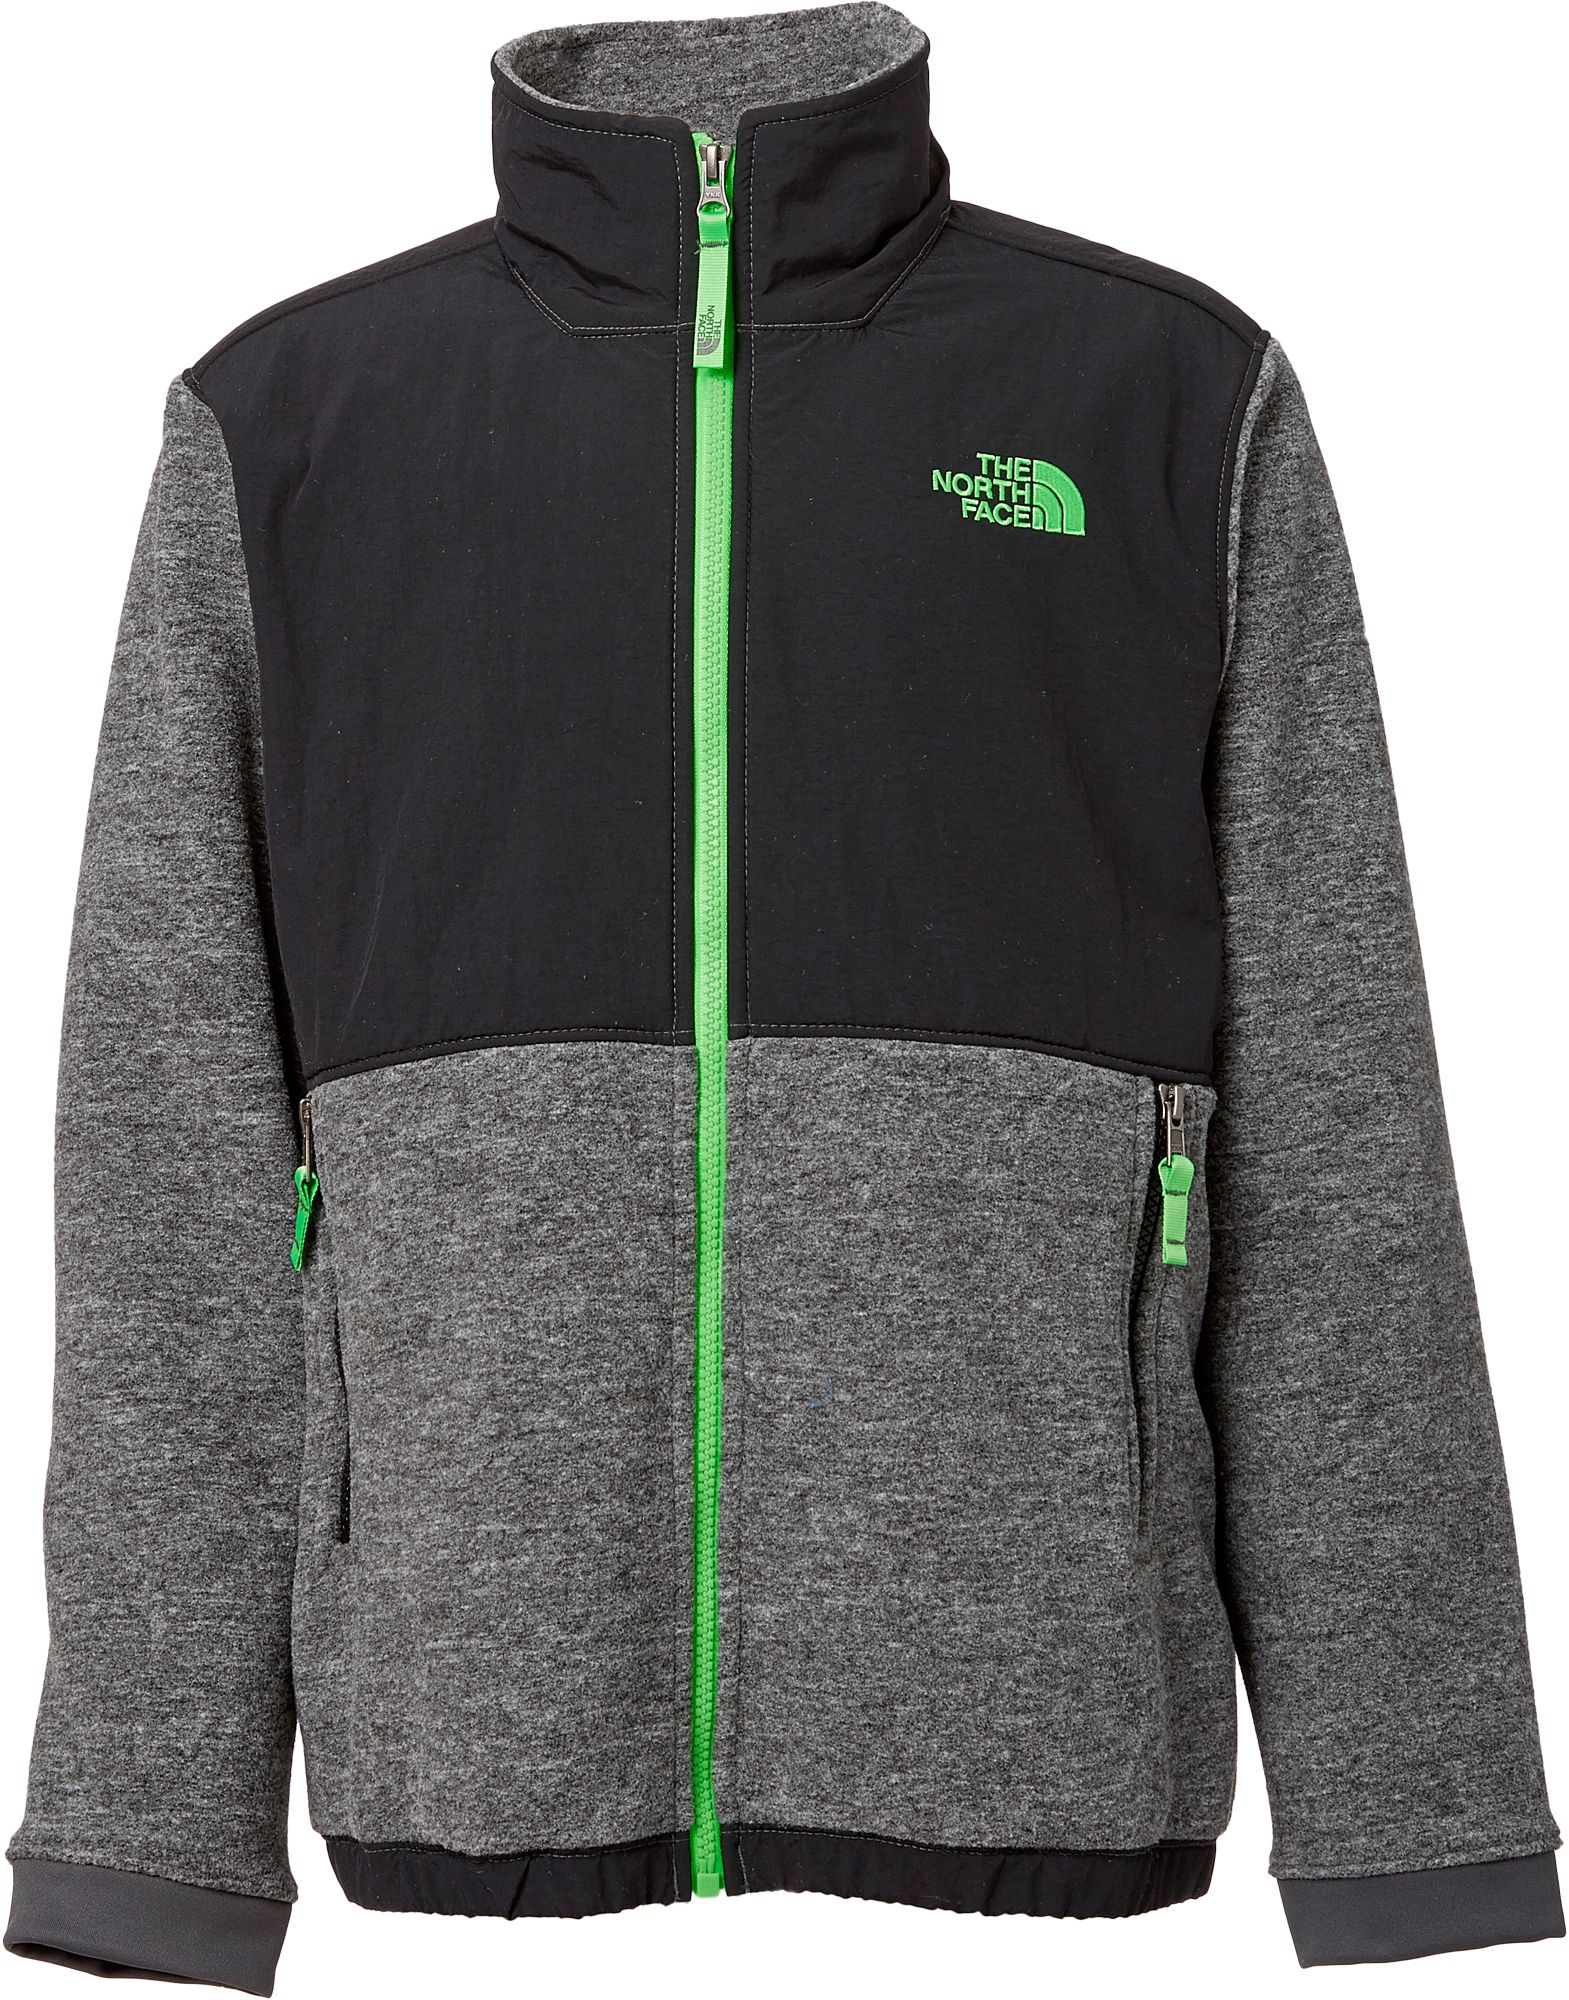 Product Image · The North Face Boys' Denali Fleece Jacket